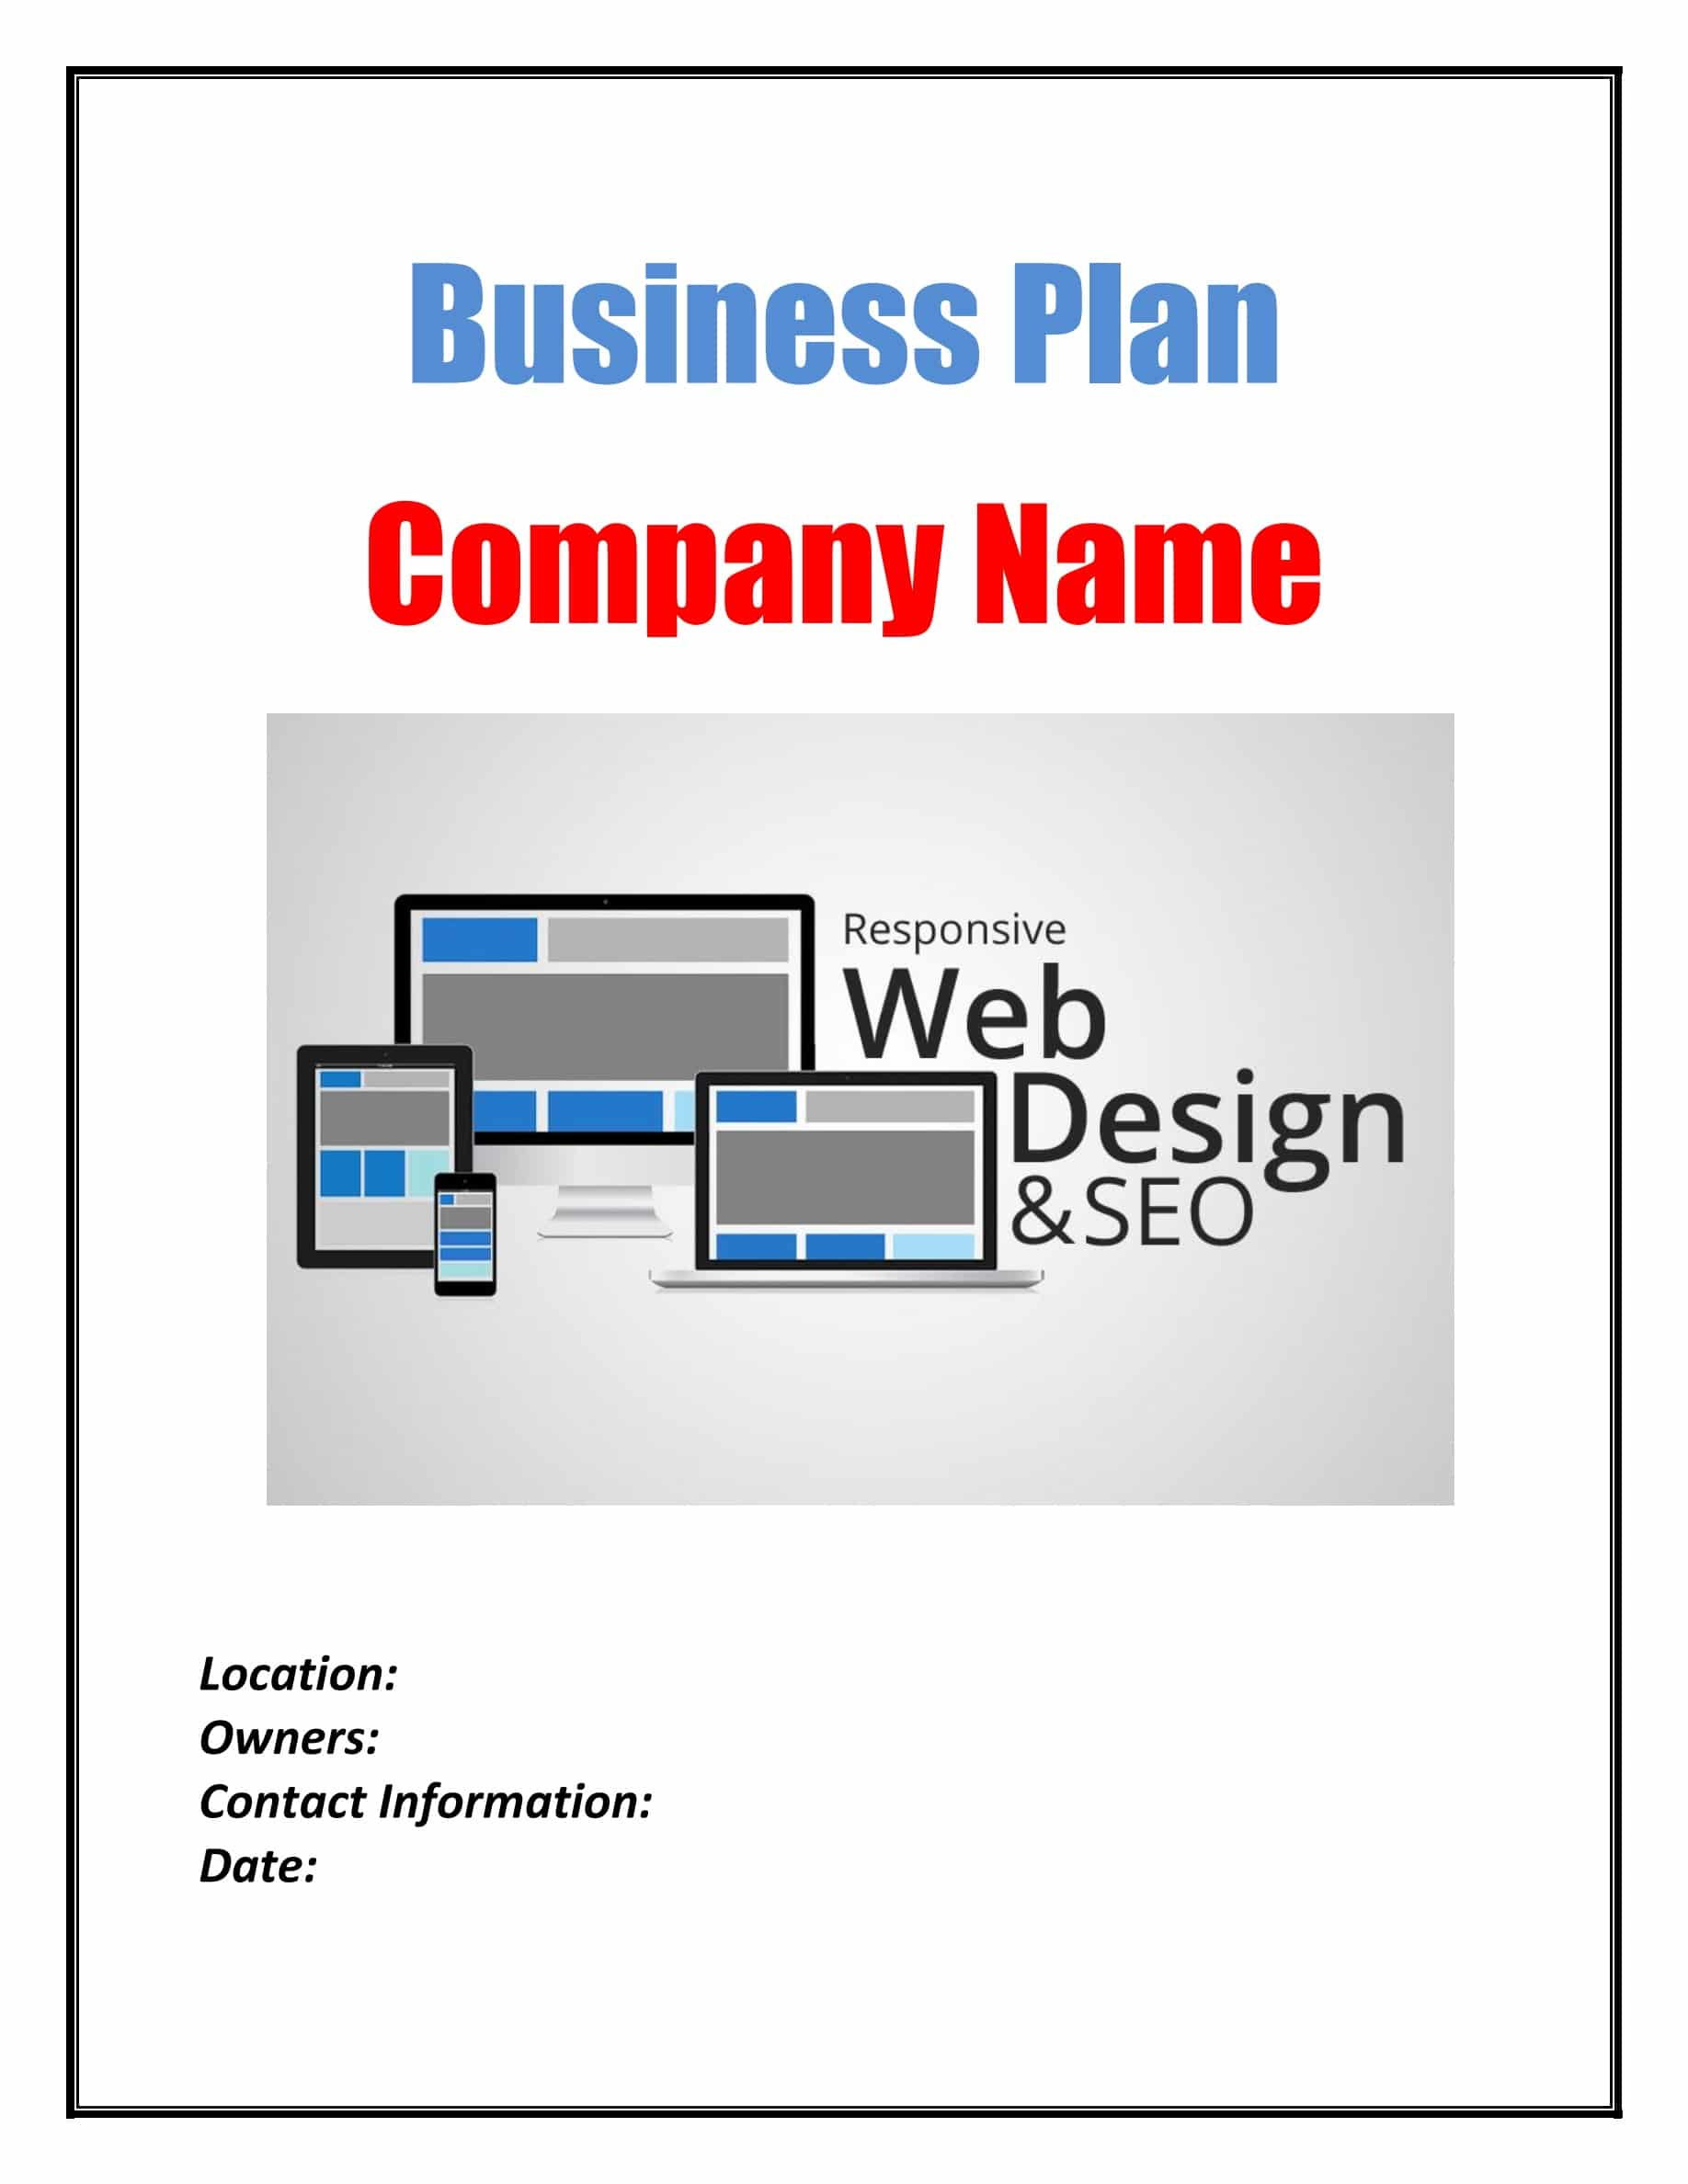 Example business plan web design best university term paper help